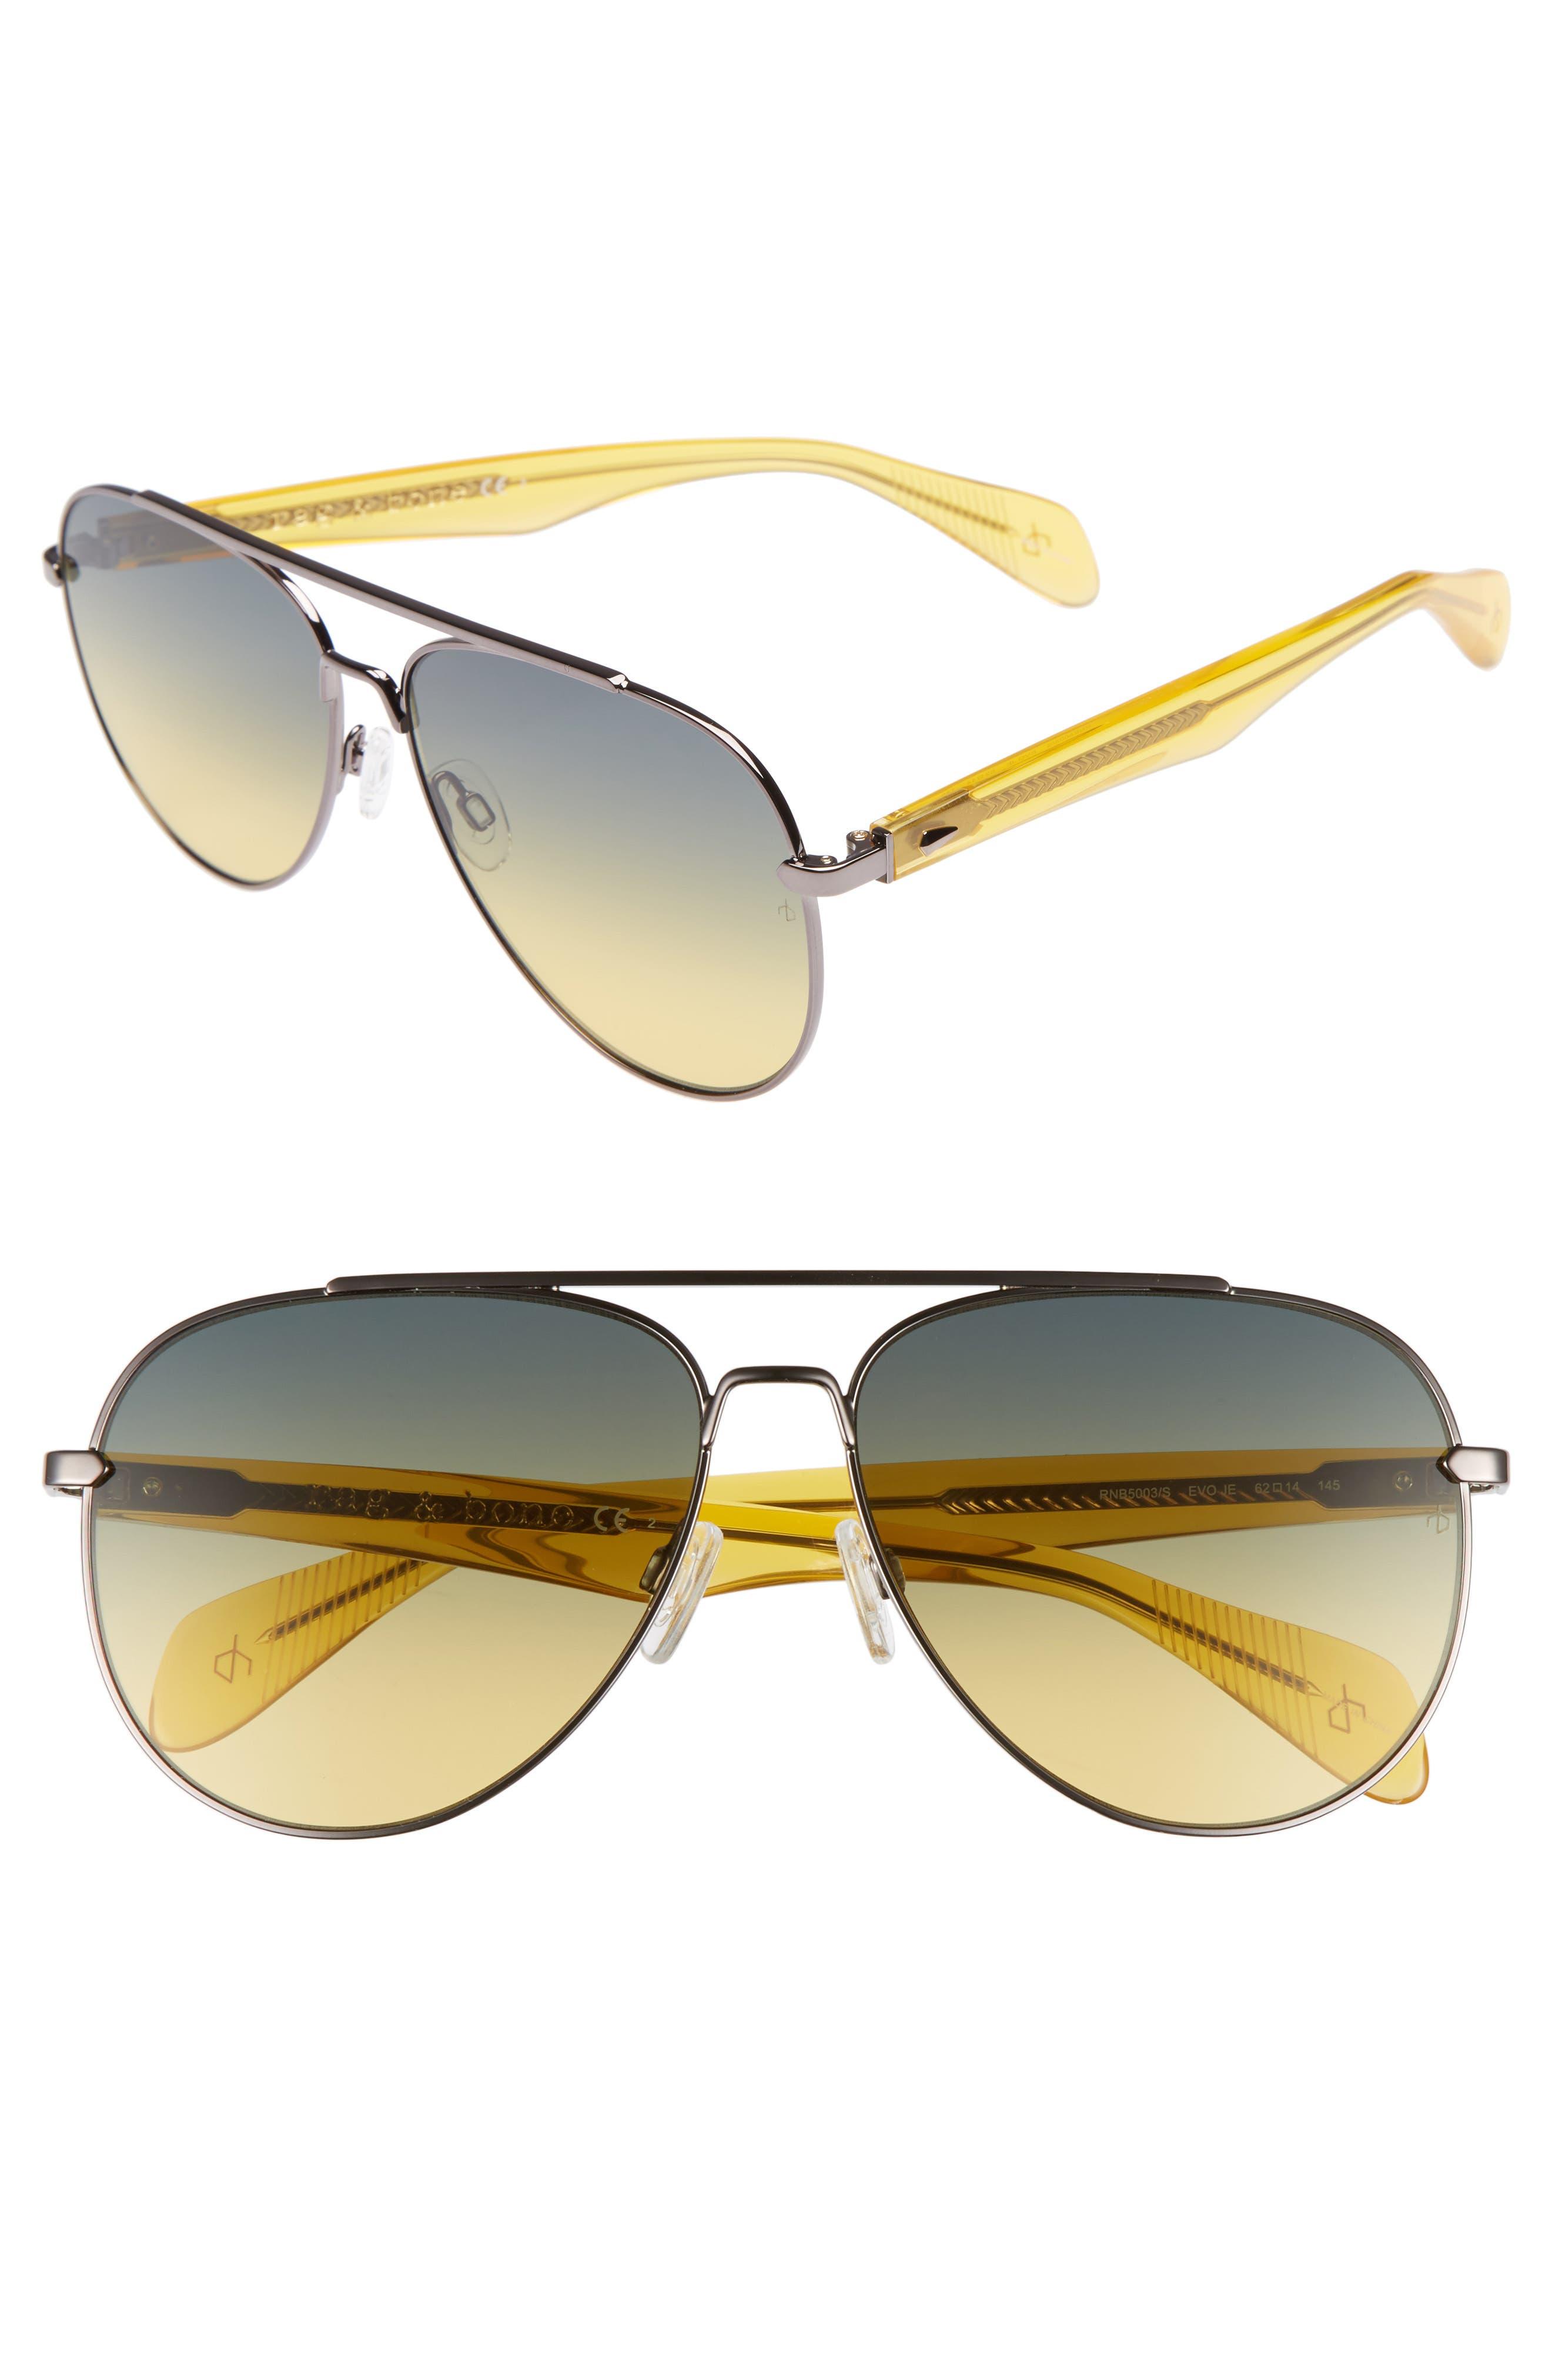 62mm Oversize Aviator Sunglasses,                         Main,                         color, Ruthenium/ Yellow